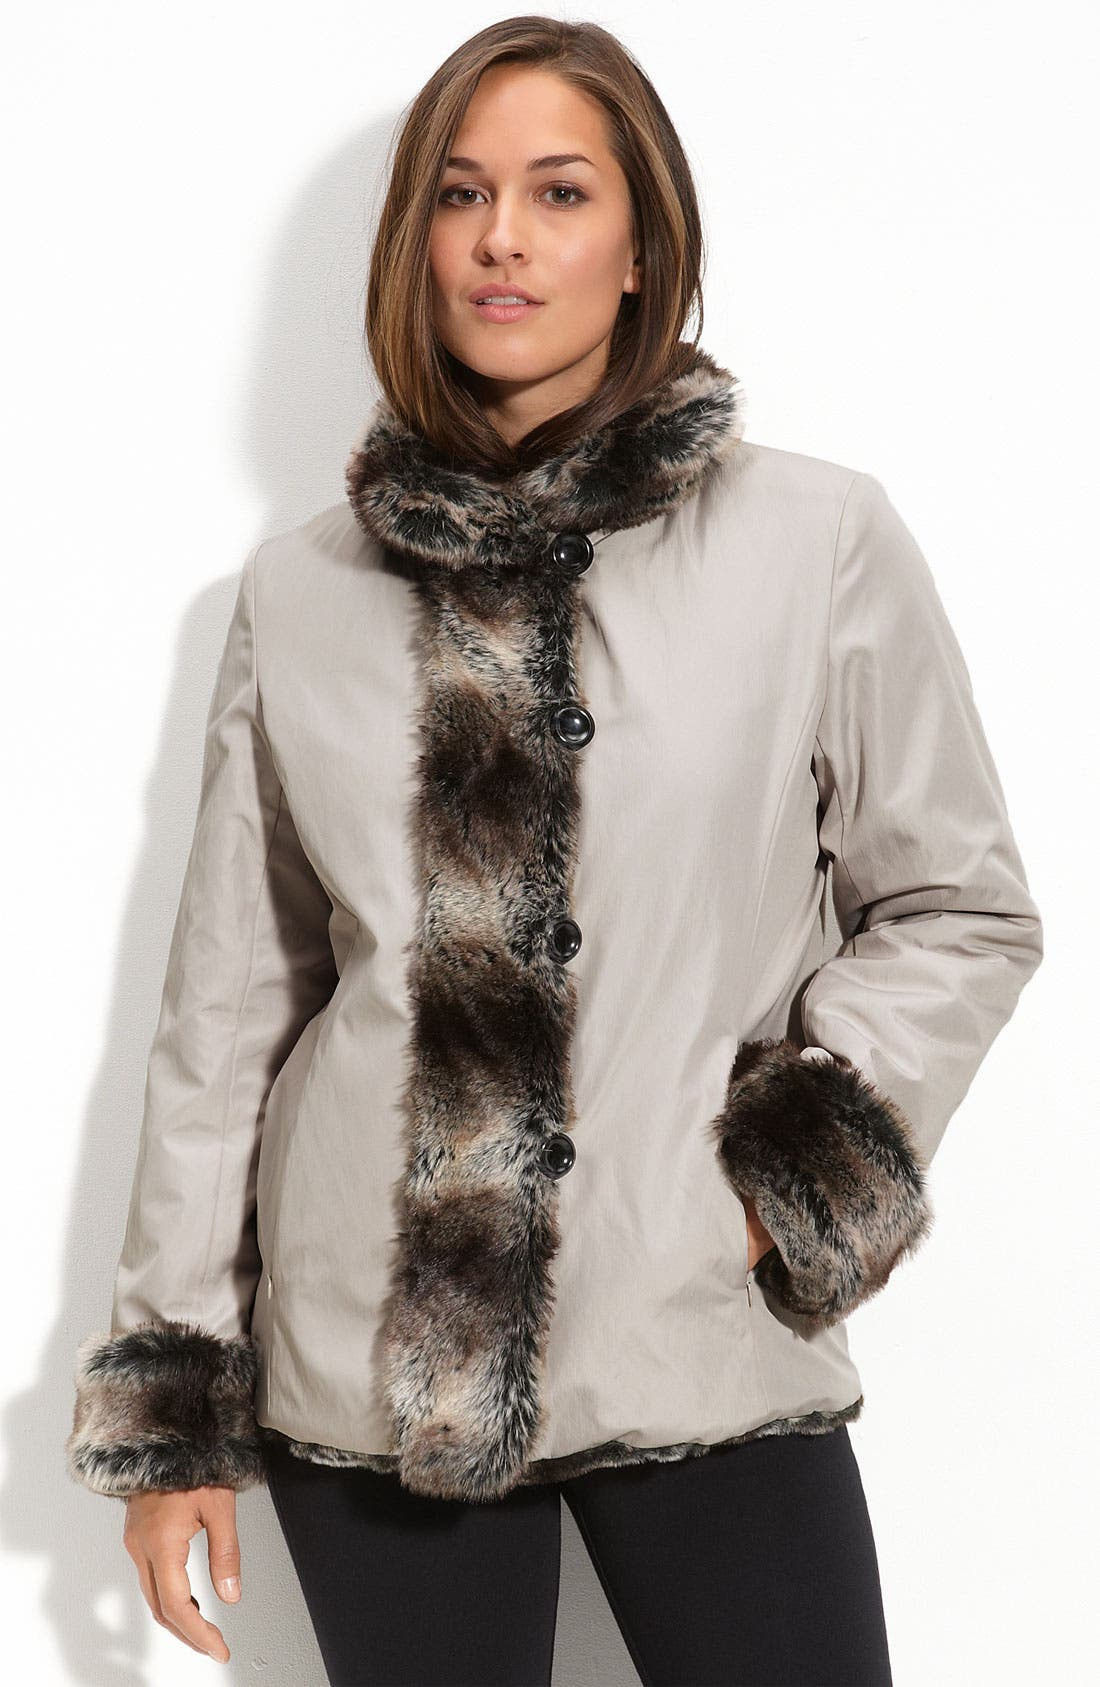 Utex Reversible Faux Fur Coat,                             Main thumbnail 1, color,                             040